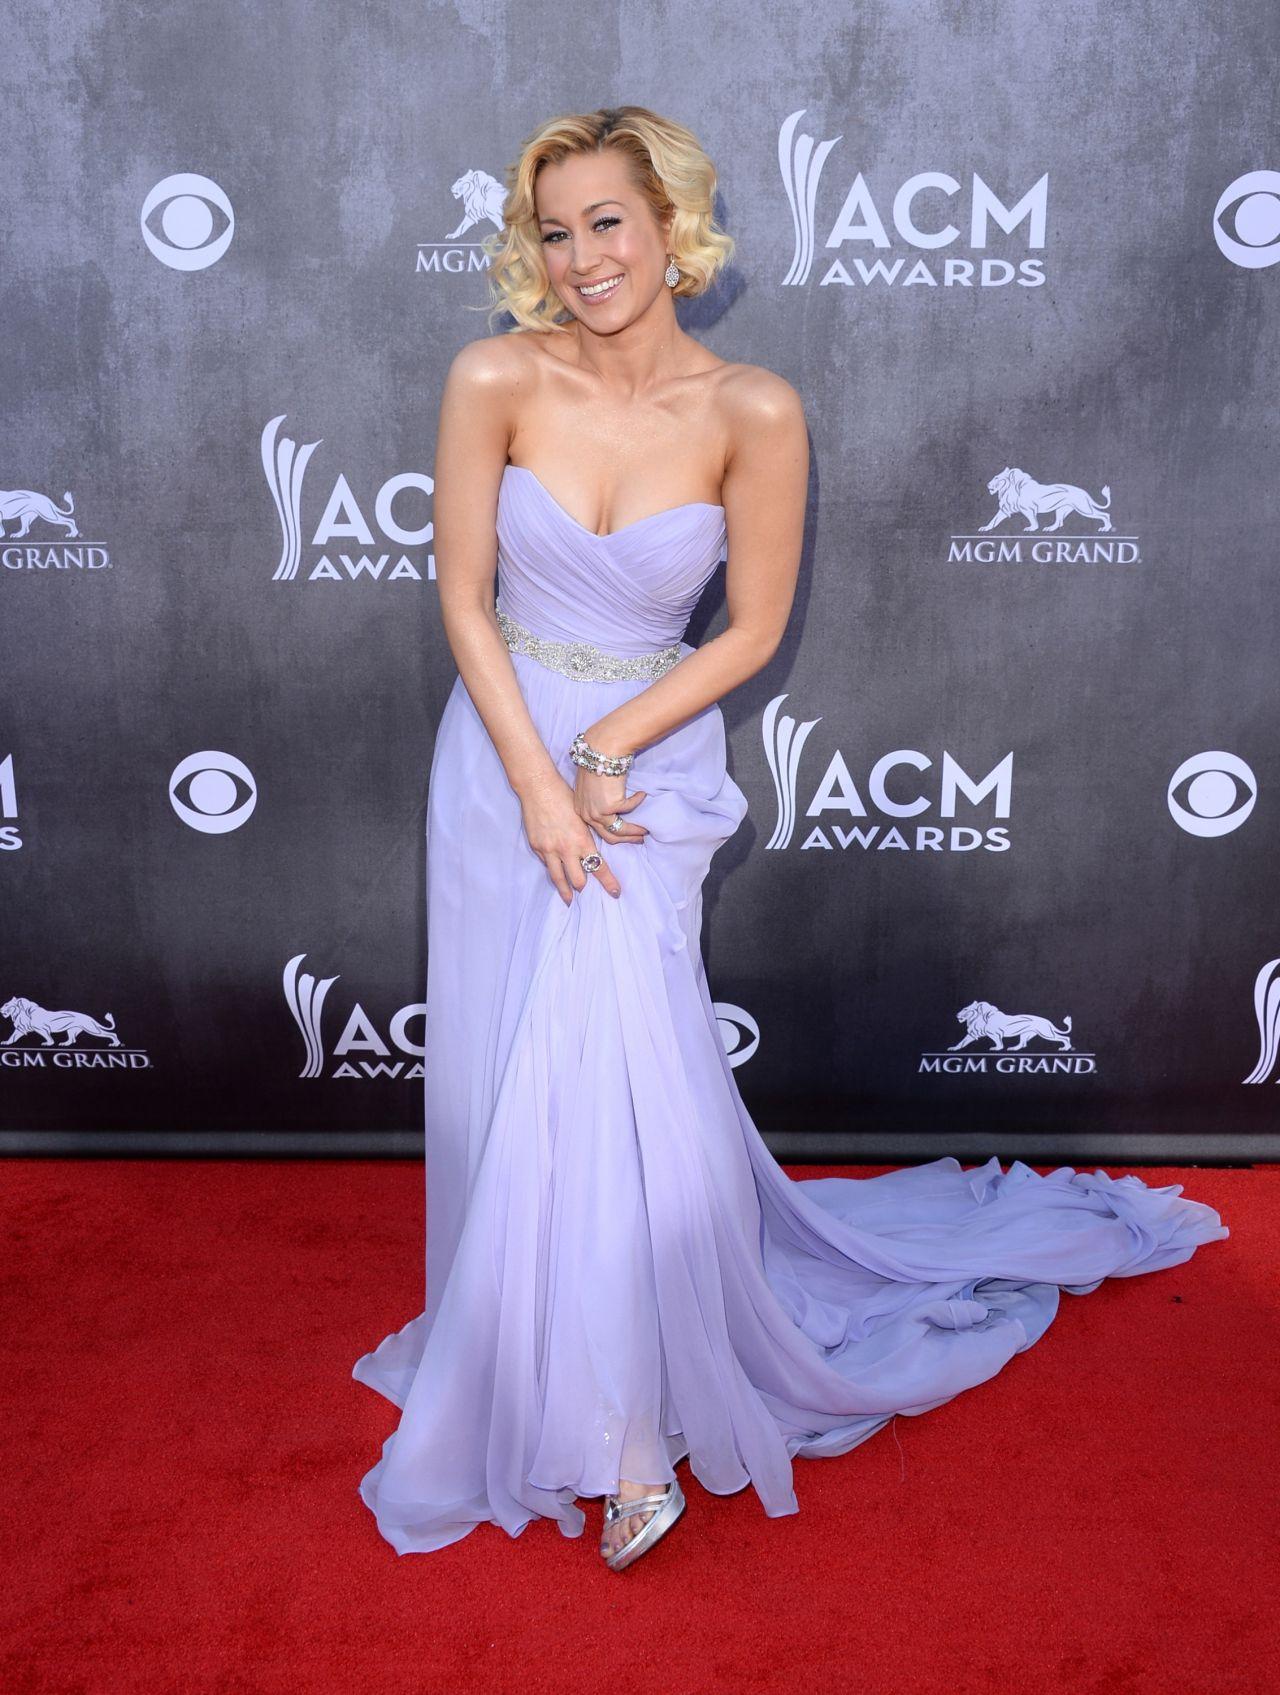 Kellie Pickler In Romona Keveza Gown 2014 Academy Of